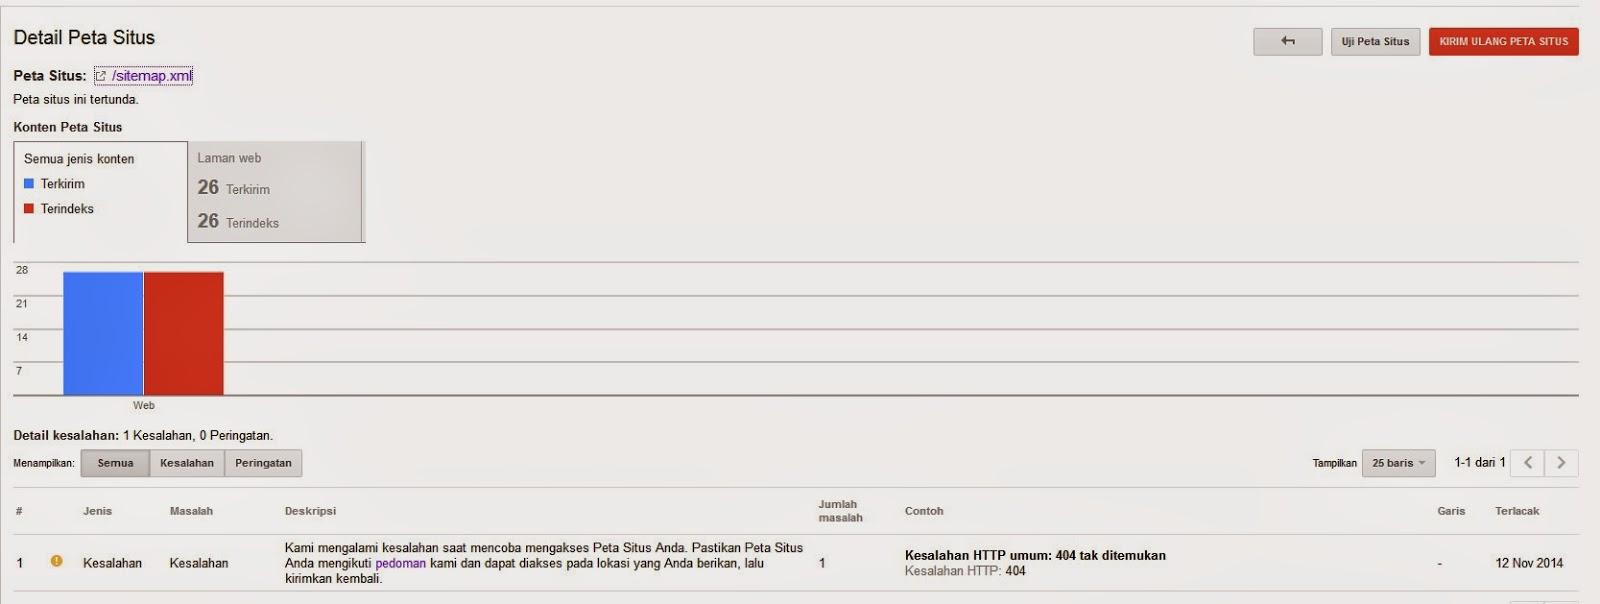 how to fix sitemap xml error 404 for blogger blogspot tld domain